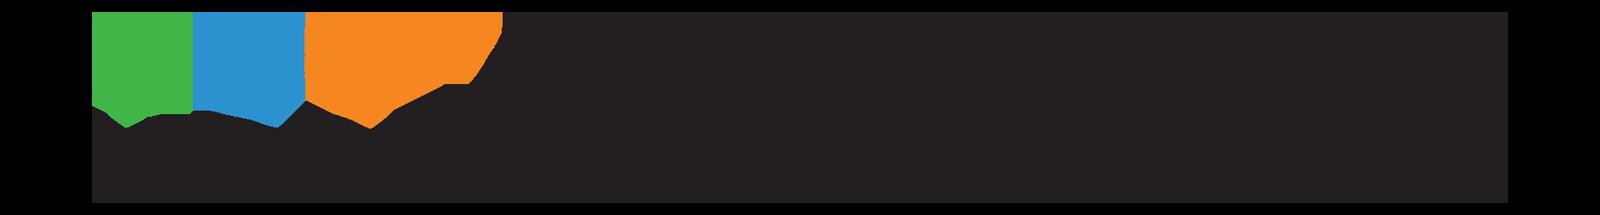 Mortgage Connect LLC logo